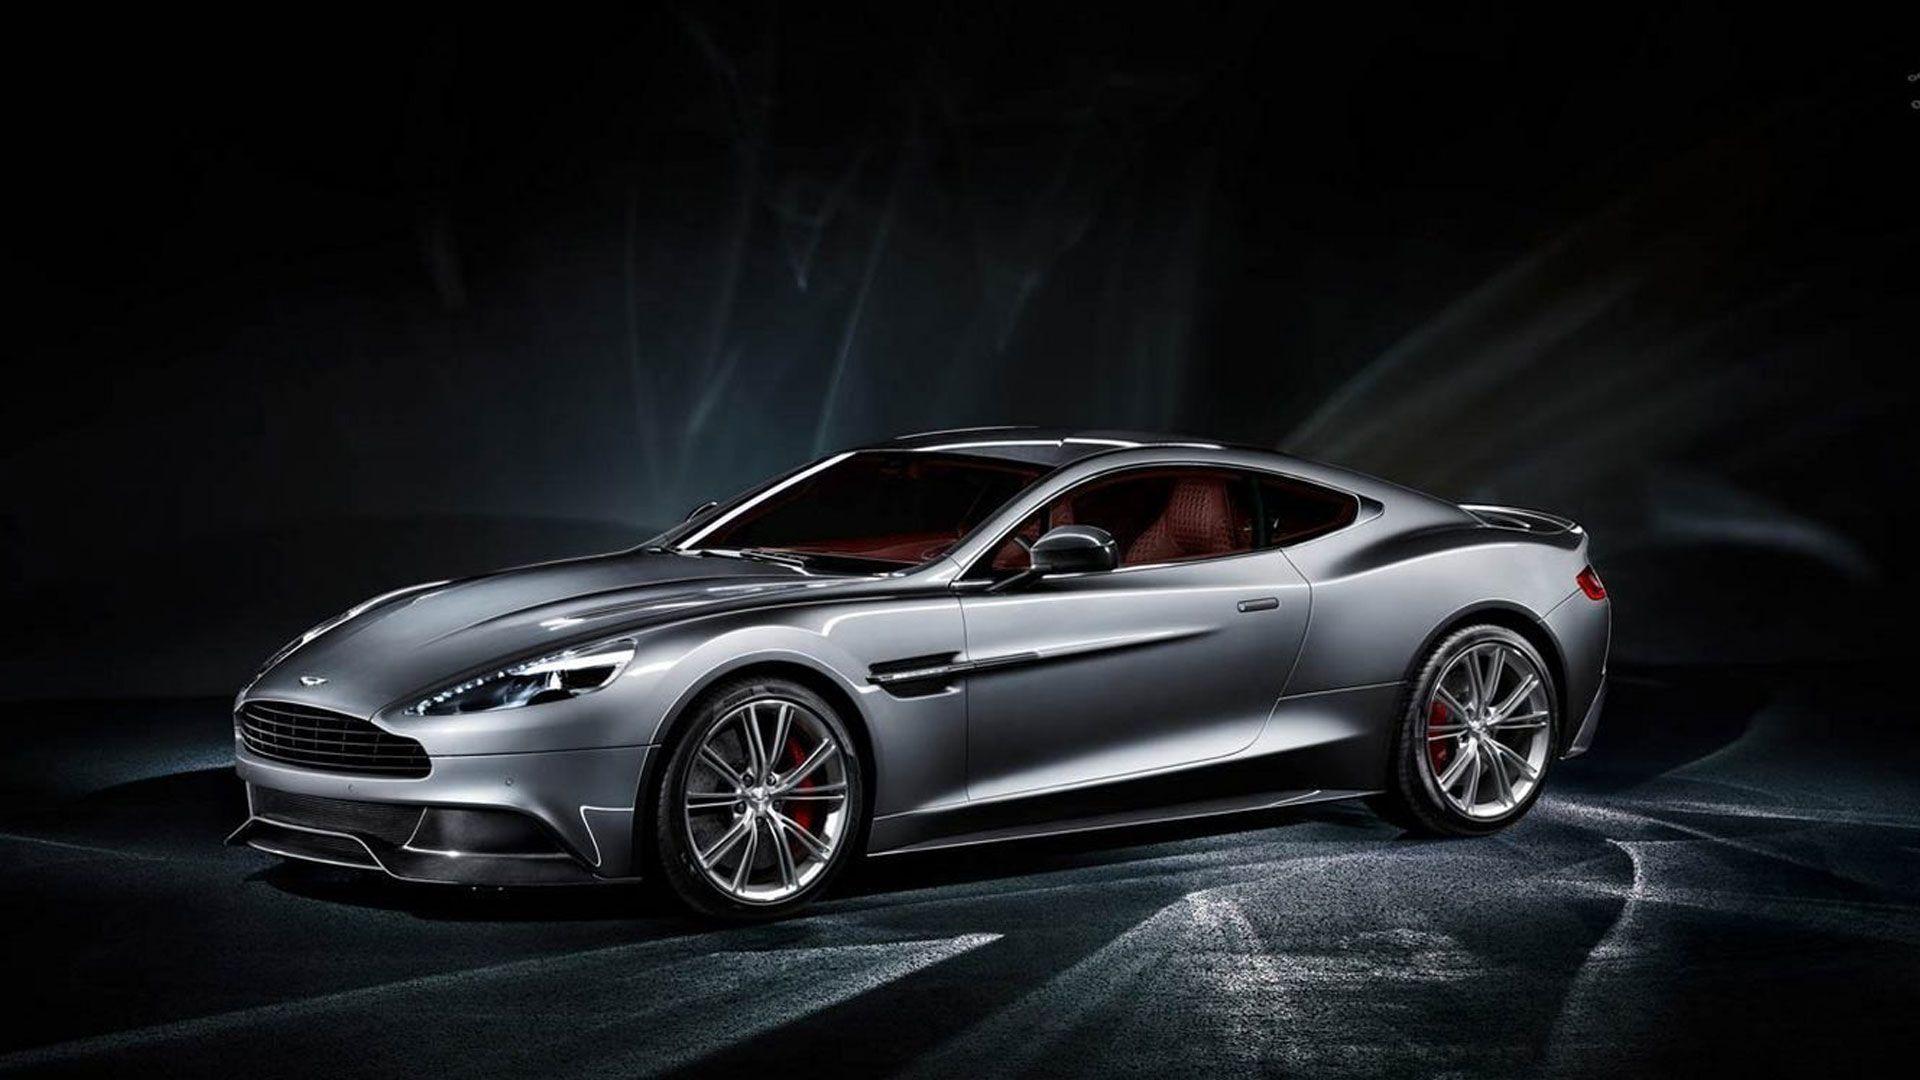 Vanquish Q By Aston Martin 2014 British Motors Pinterest Aston